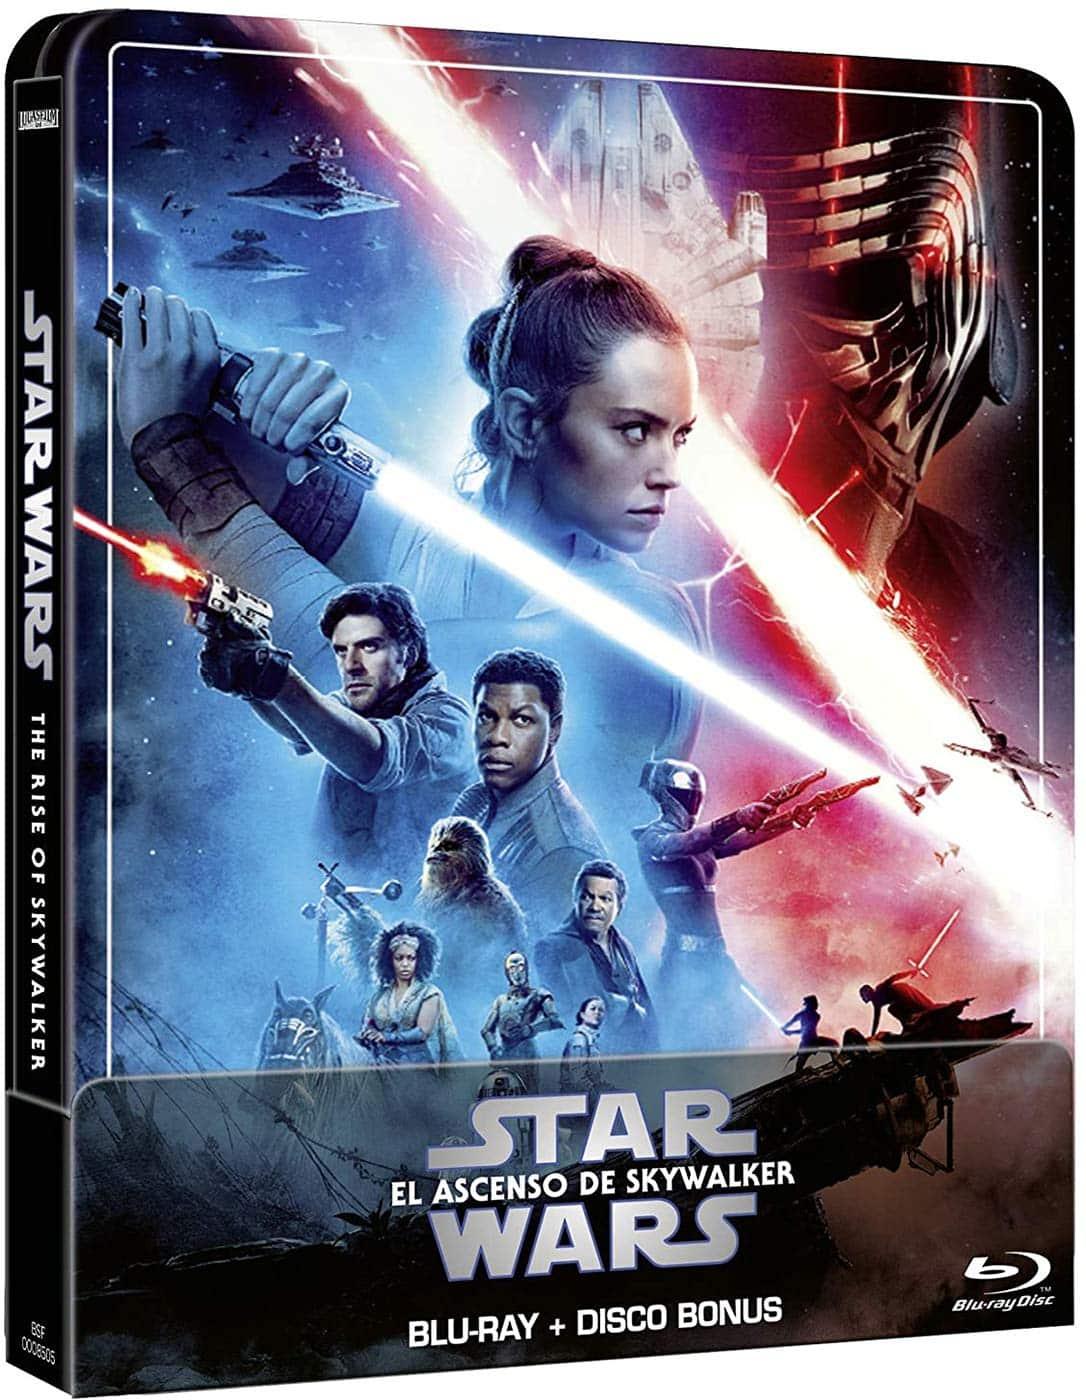 Star Wars: El Ascenso de Skywalker - Steelbook 2 disco